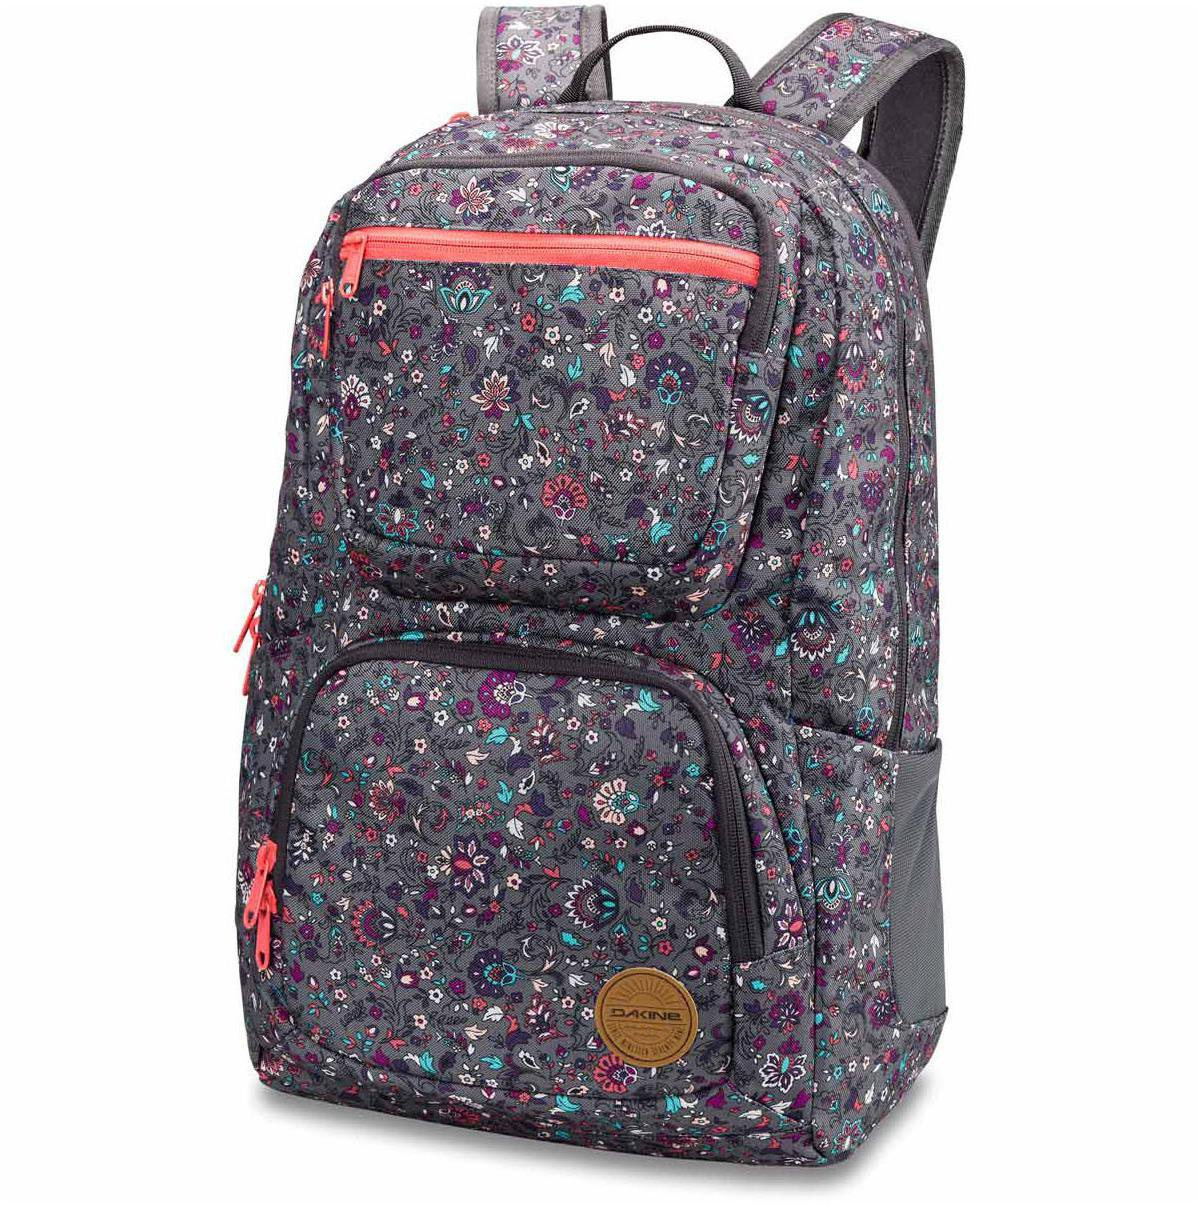 2f5579b95f1bb Sporttaschen   Rucksäcke Dakine Rucksack Jewel Pack 26 Liter NEU Laptop  Damen Backpack